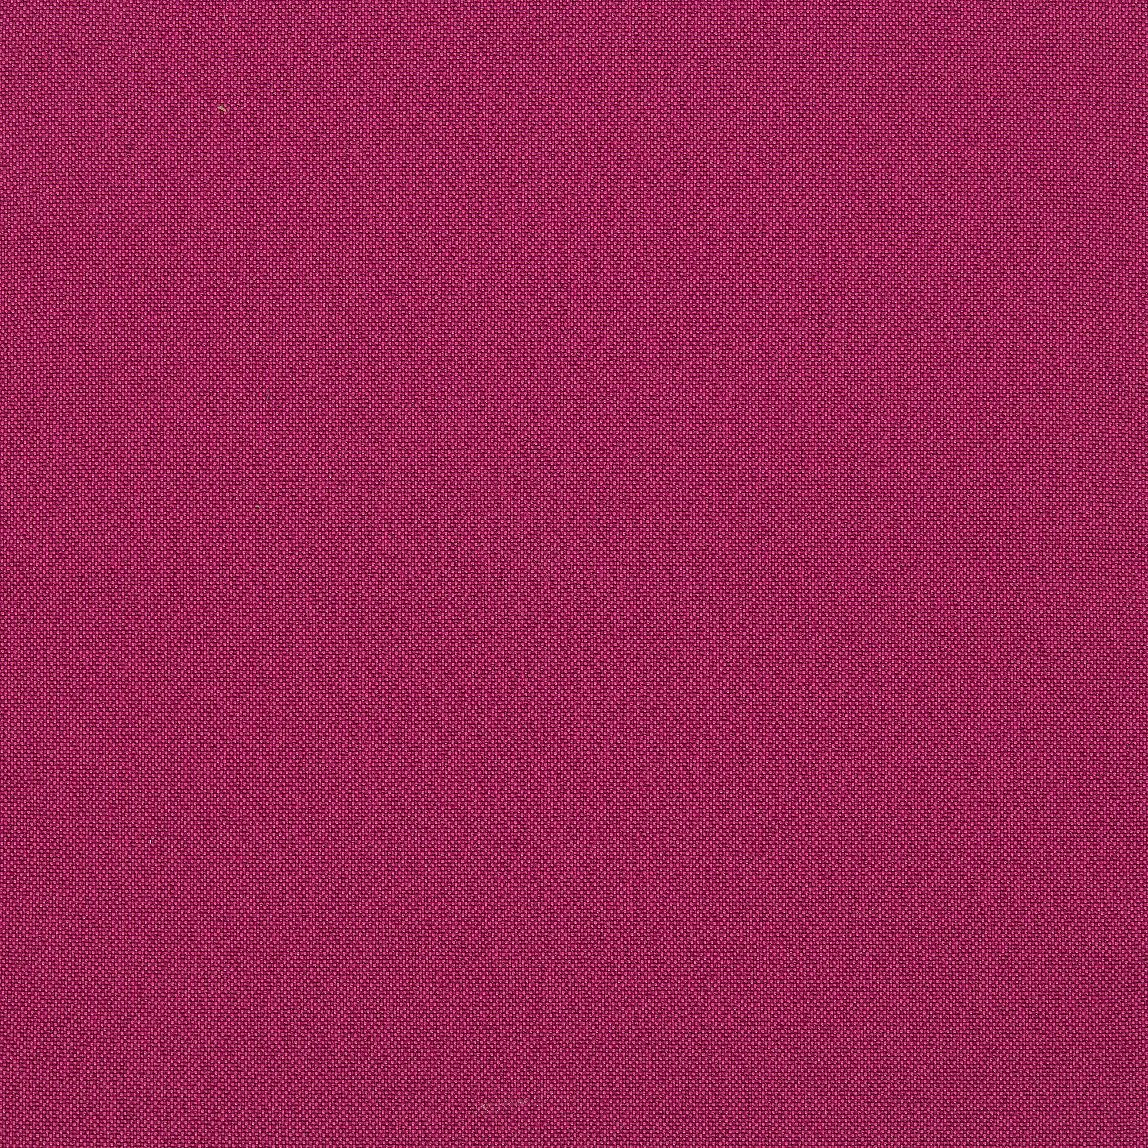 Meld Fuchsia Swatch